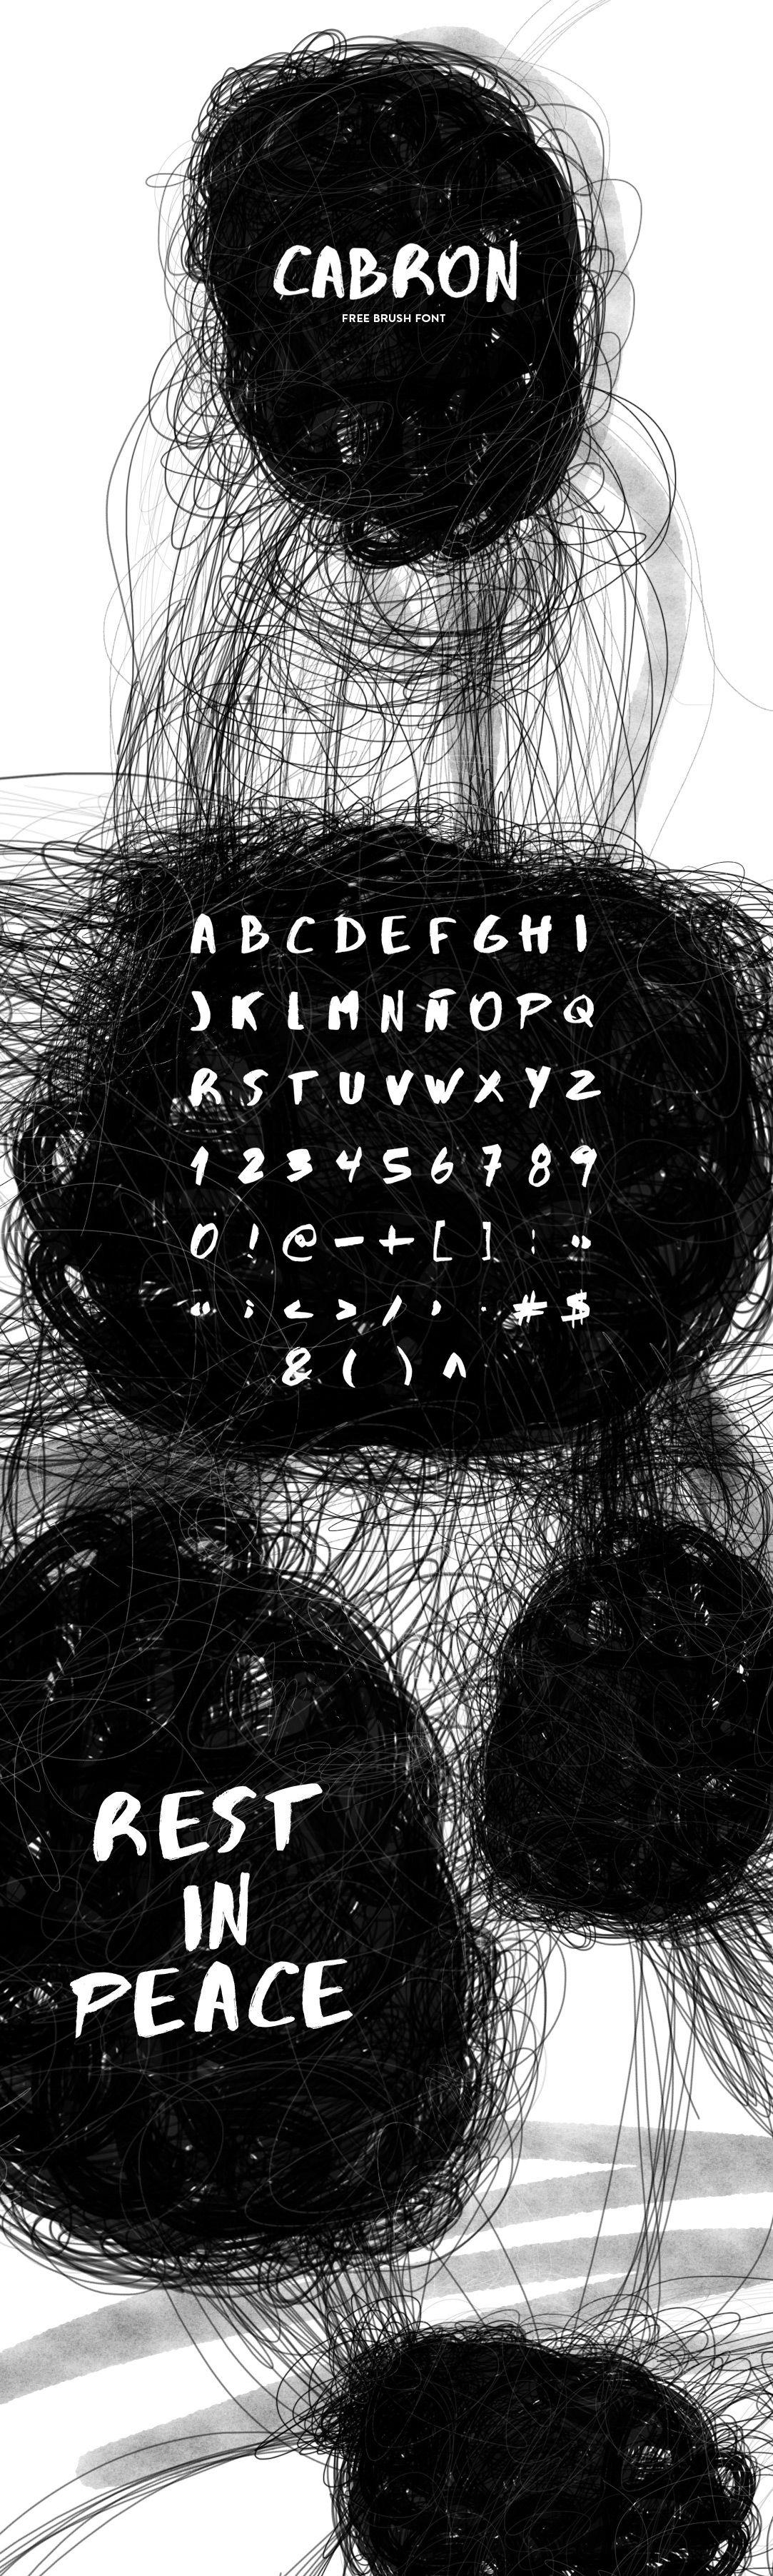 Https Drive Google Com File D 0b756wkgzdimvdevxcfl6bxbvnfu View Usp Sharing Graphic Design Fonts Fonts Design Brush Font